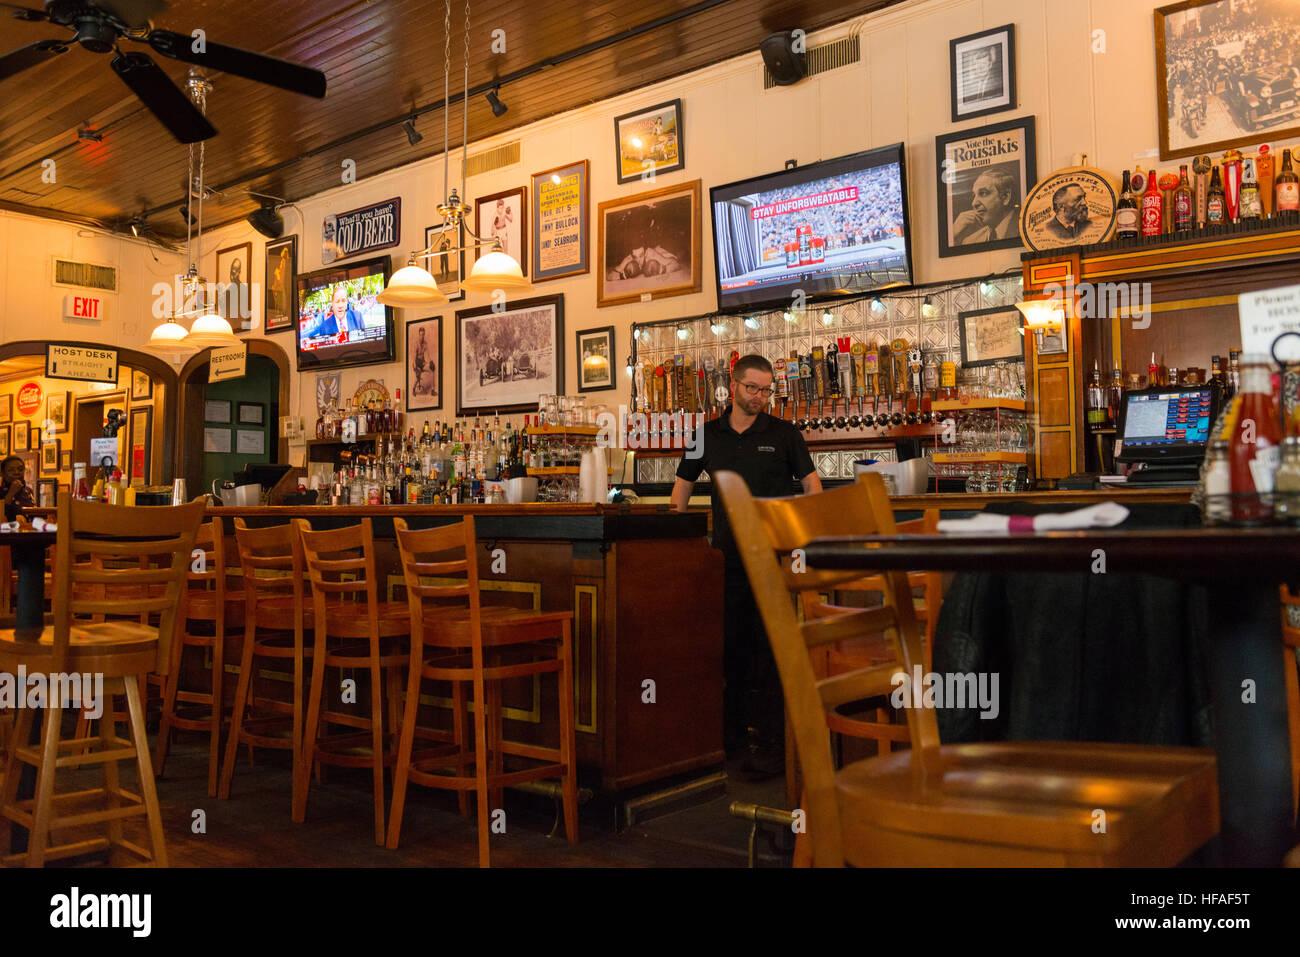 Bar Stools Pub Stockfotos & Bar Stools Pub Bilder - Alamy